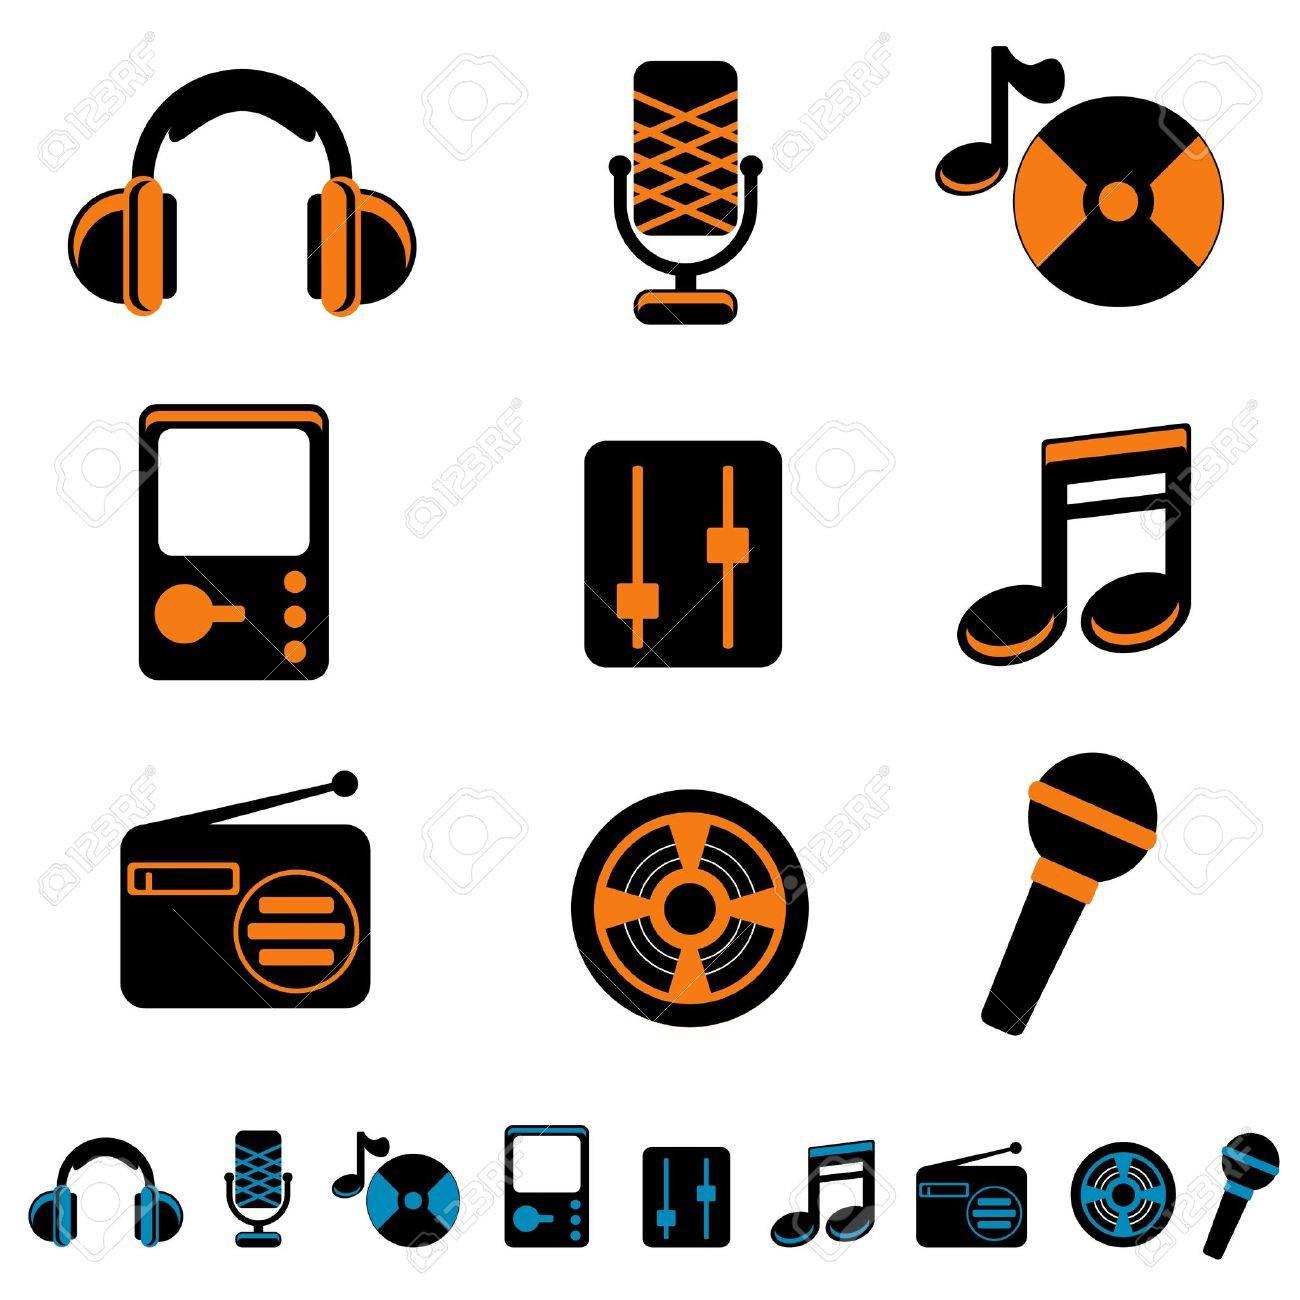 music icon set Stock Vector - 11155521